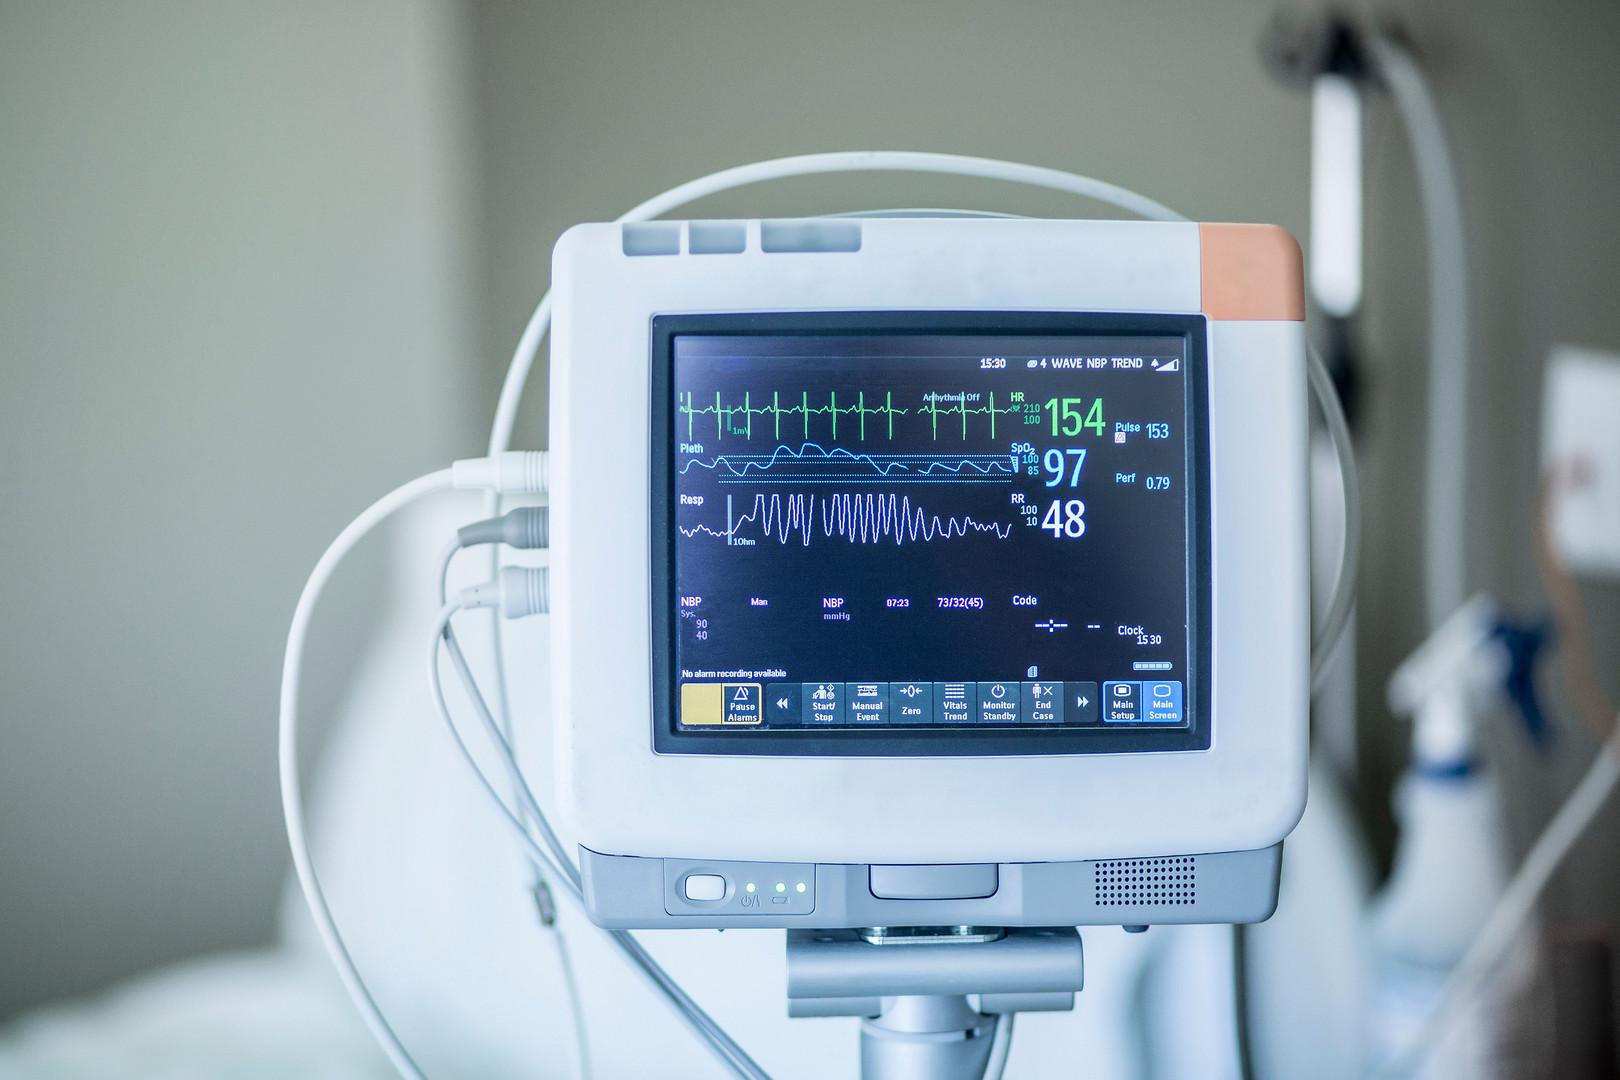 bigstock-Medical-vital-signs-monitor-in-